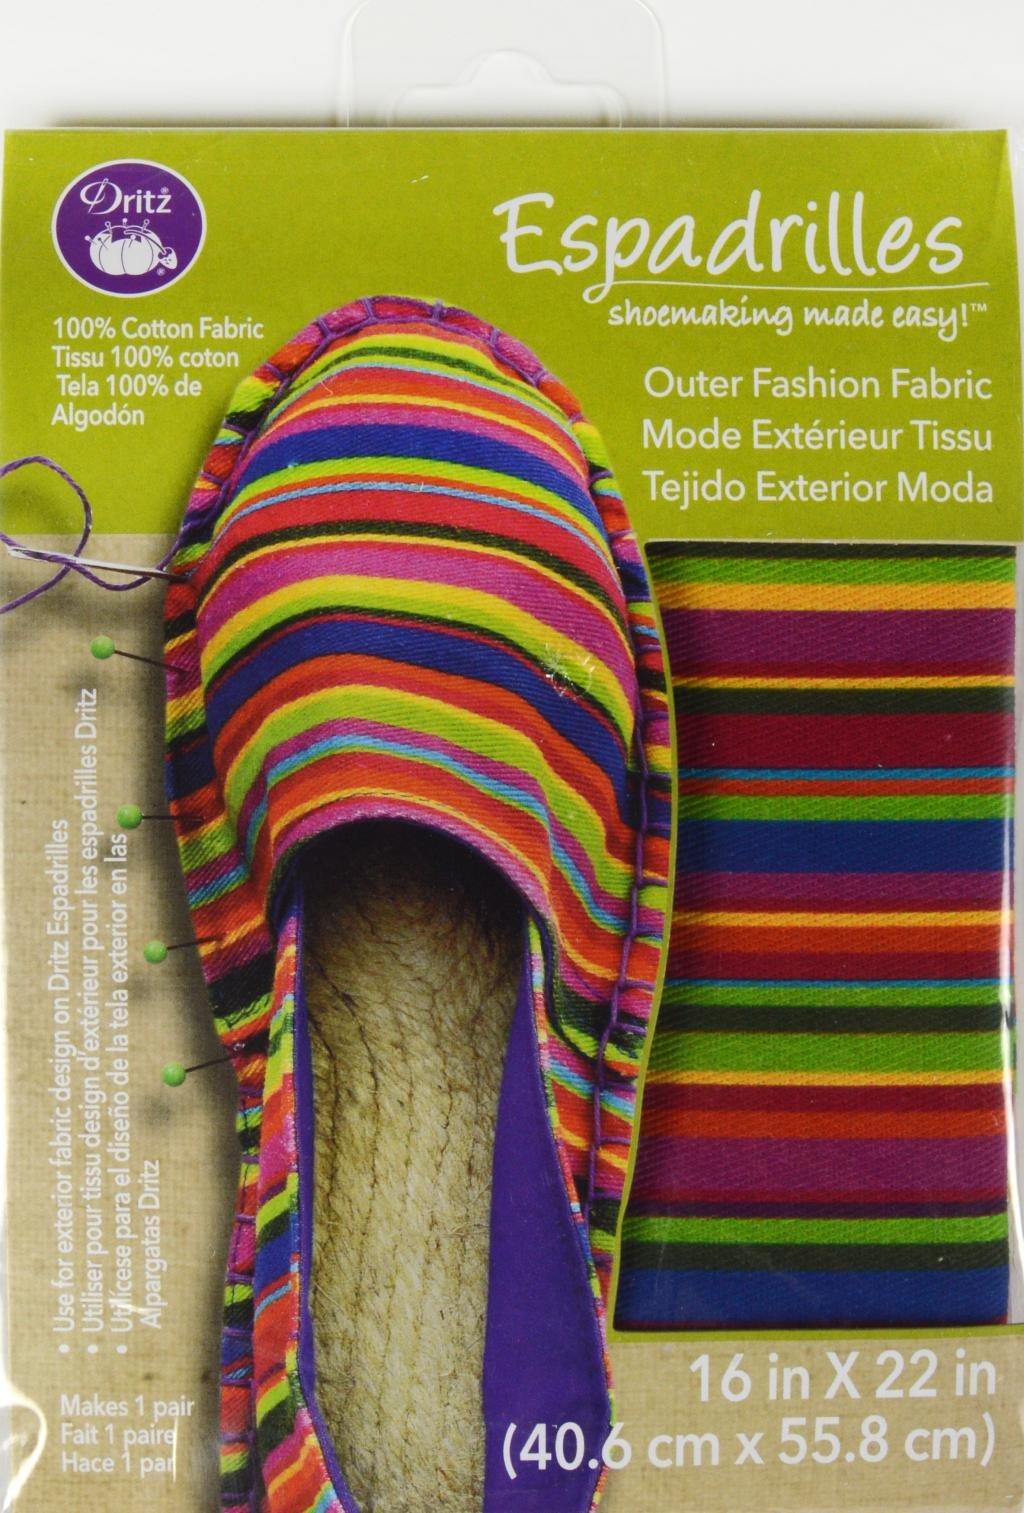 Espadrilles Shoemaking Outer Fashion Fabric Stripe